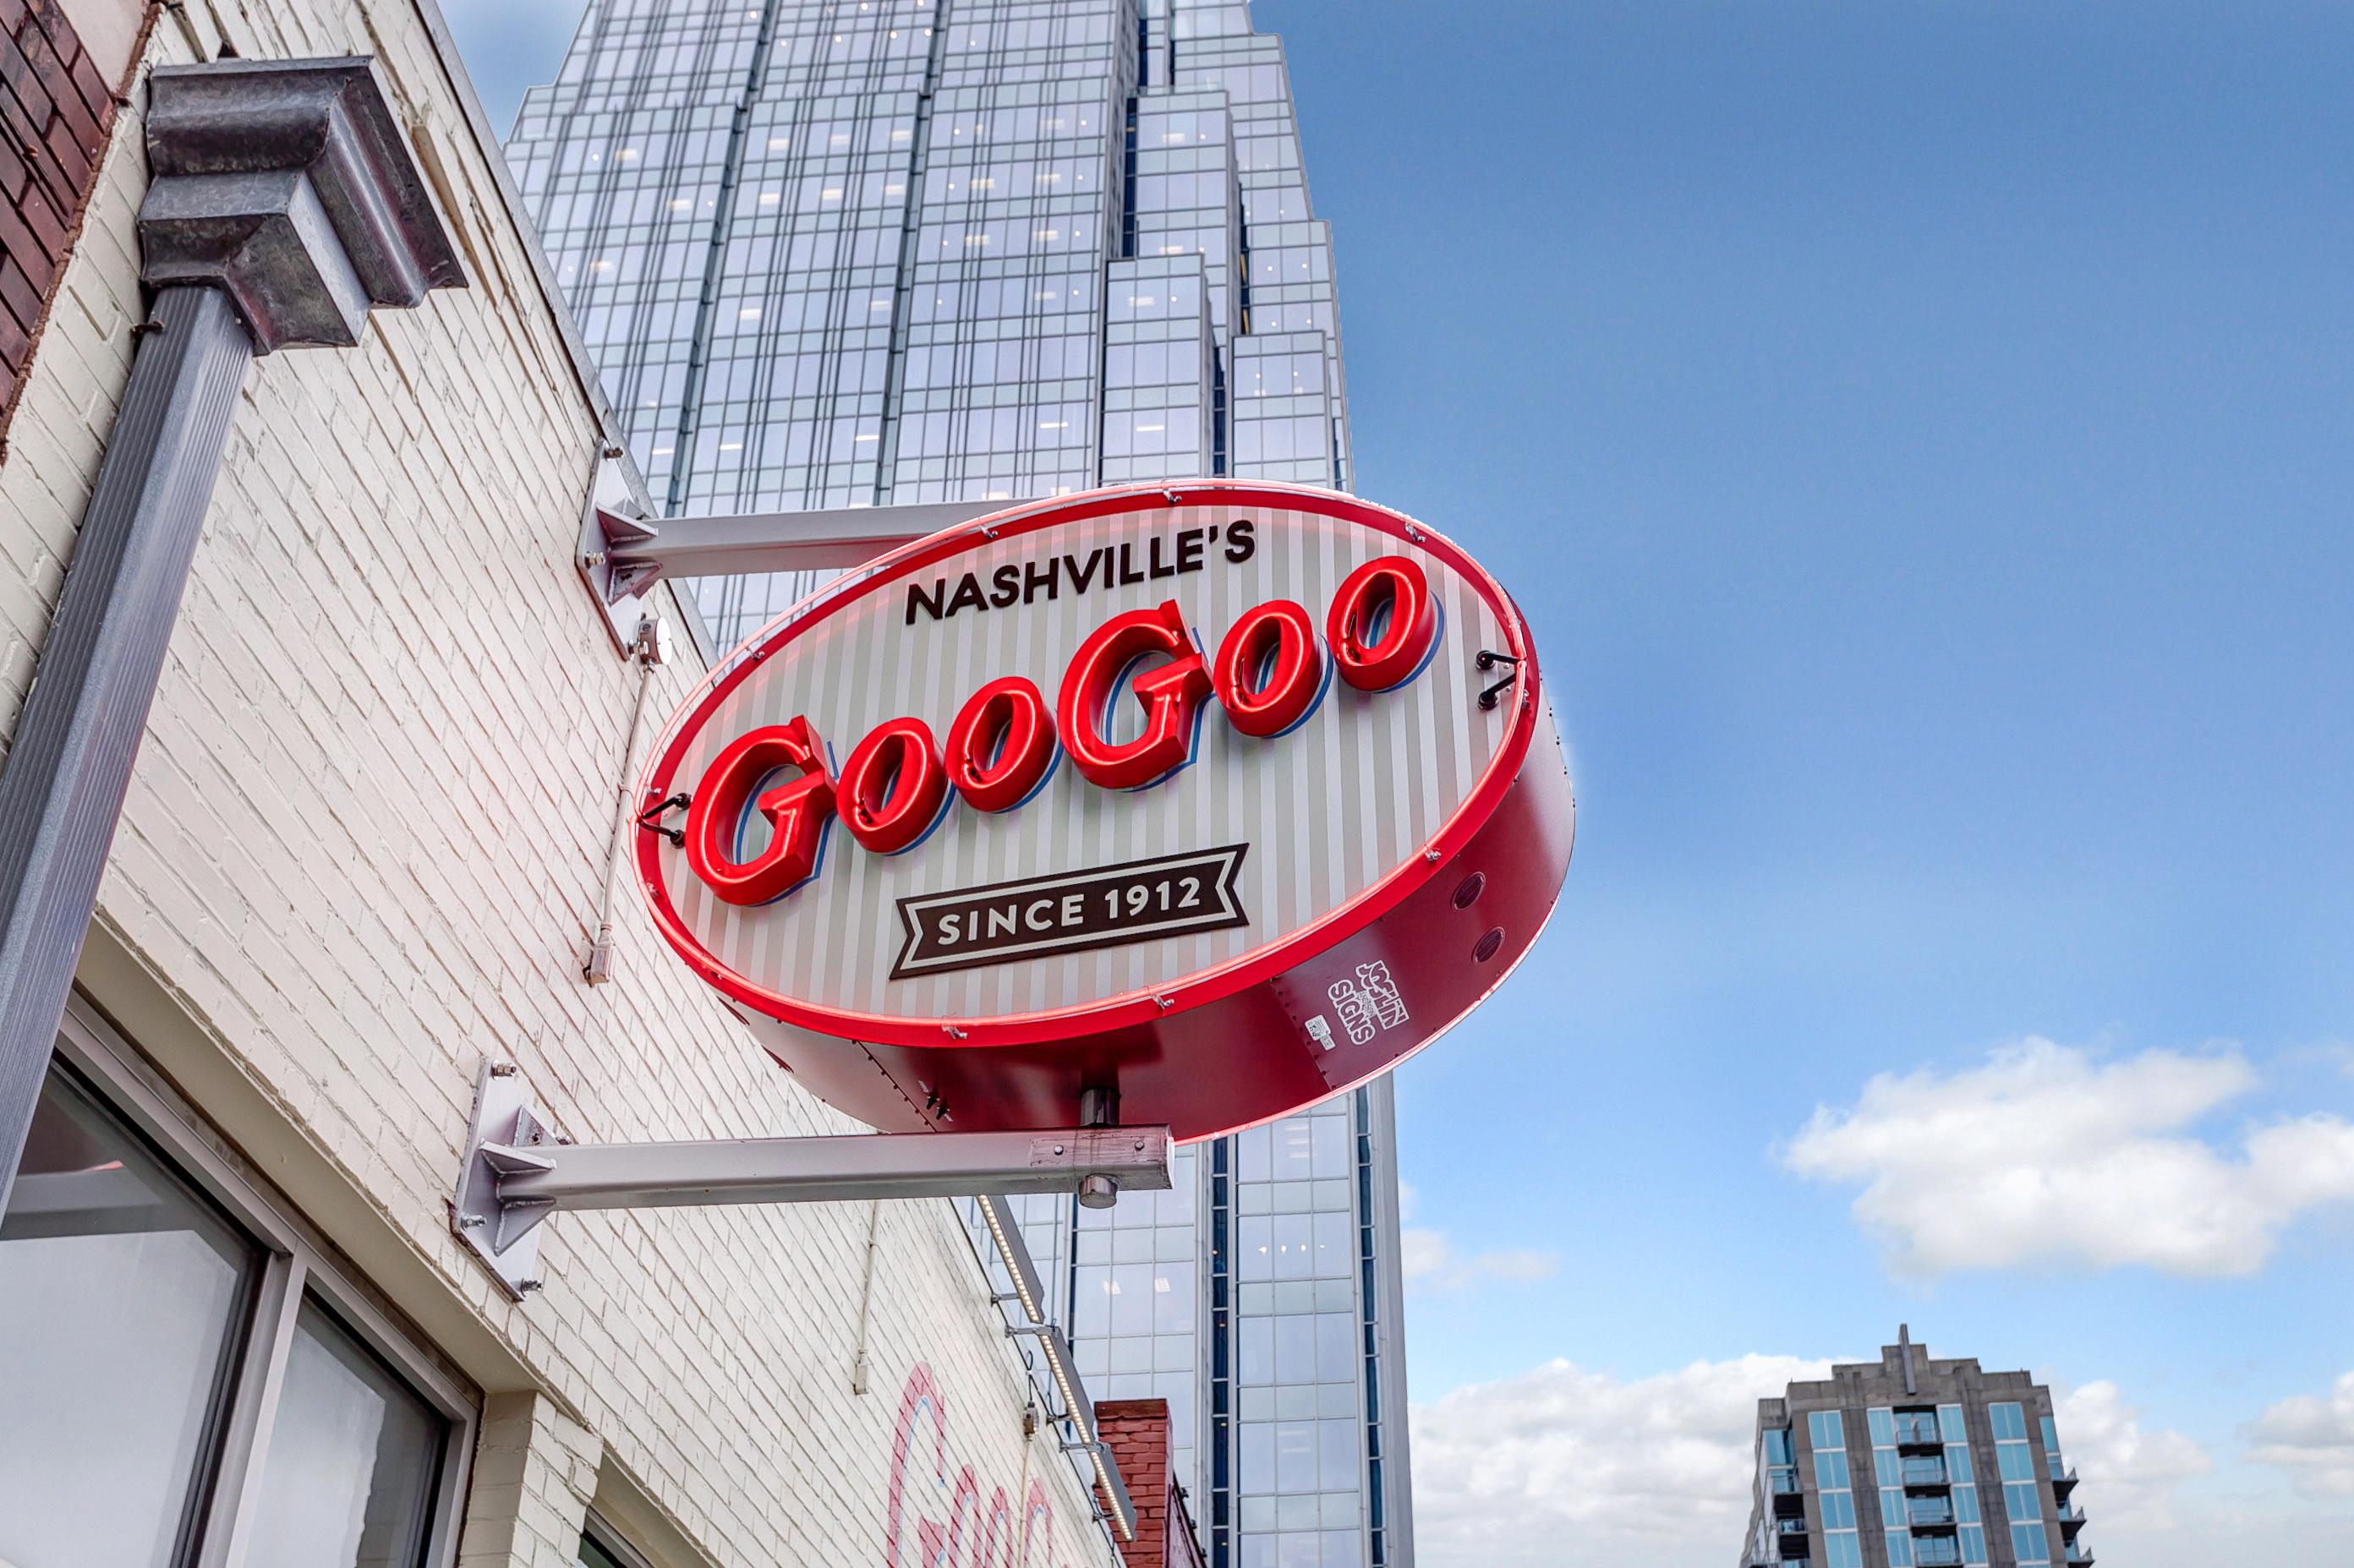 We're hiring at the Goo Goo Shop and Dessert Bar! Image